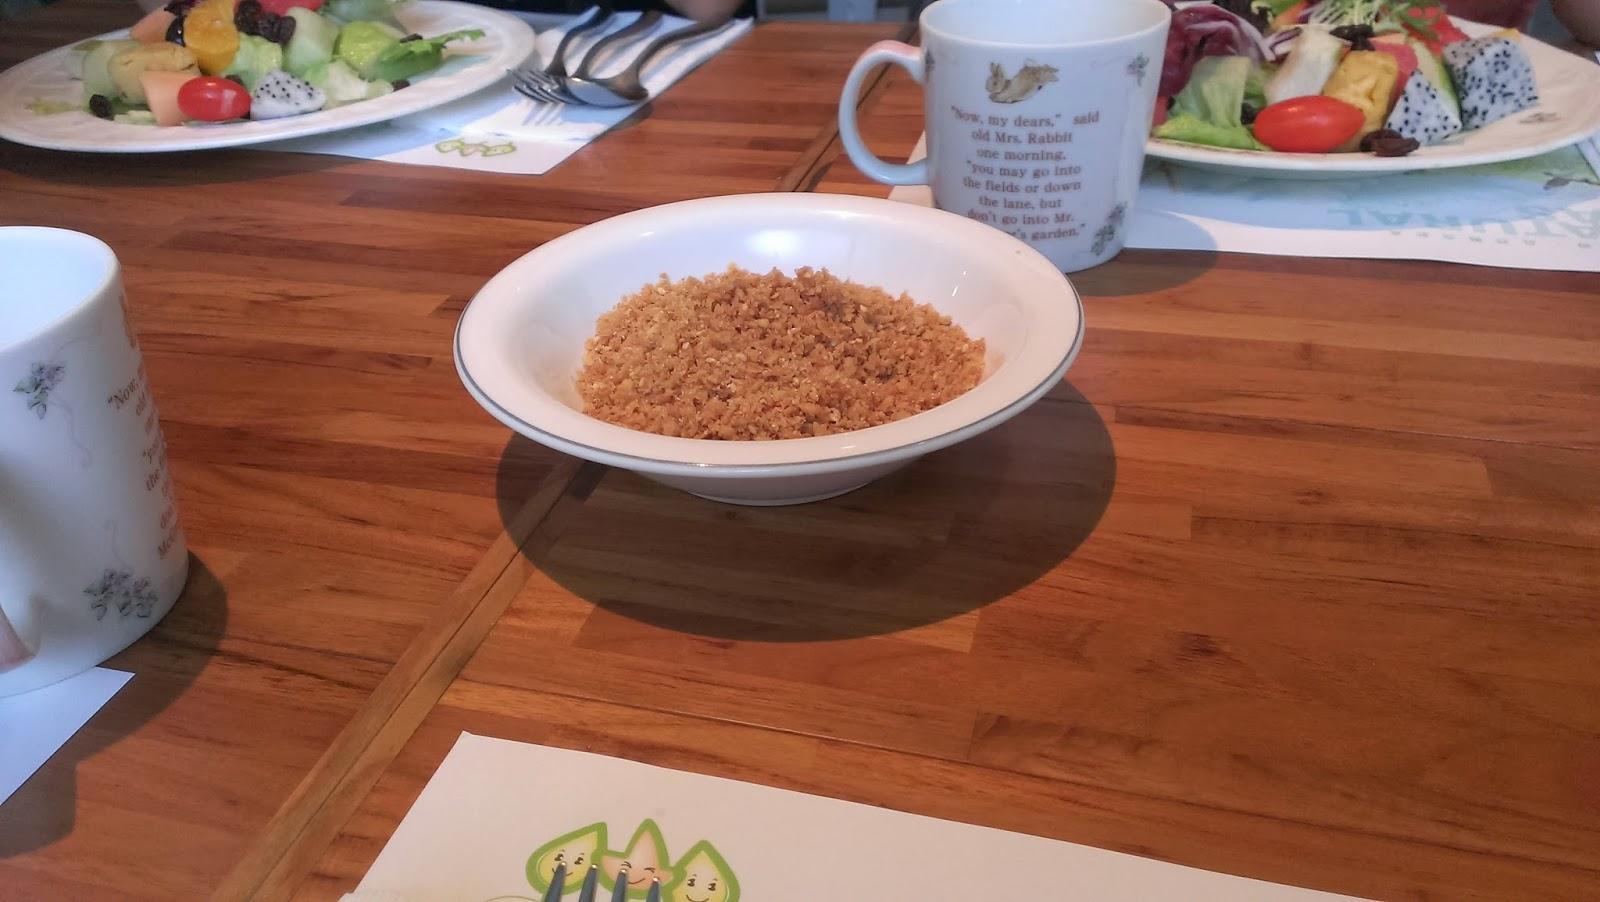 2014 09 08%2B12.38.54 - [食記] 芳庭彼得 - 義式創意無菜單料理,適合溫馨的小聚